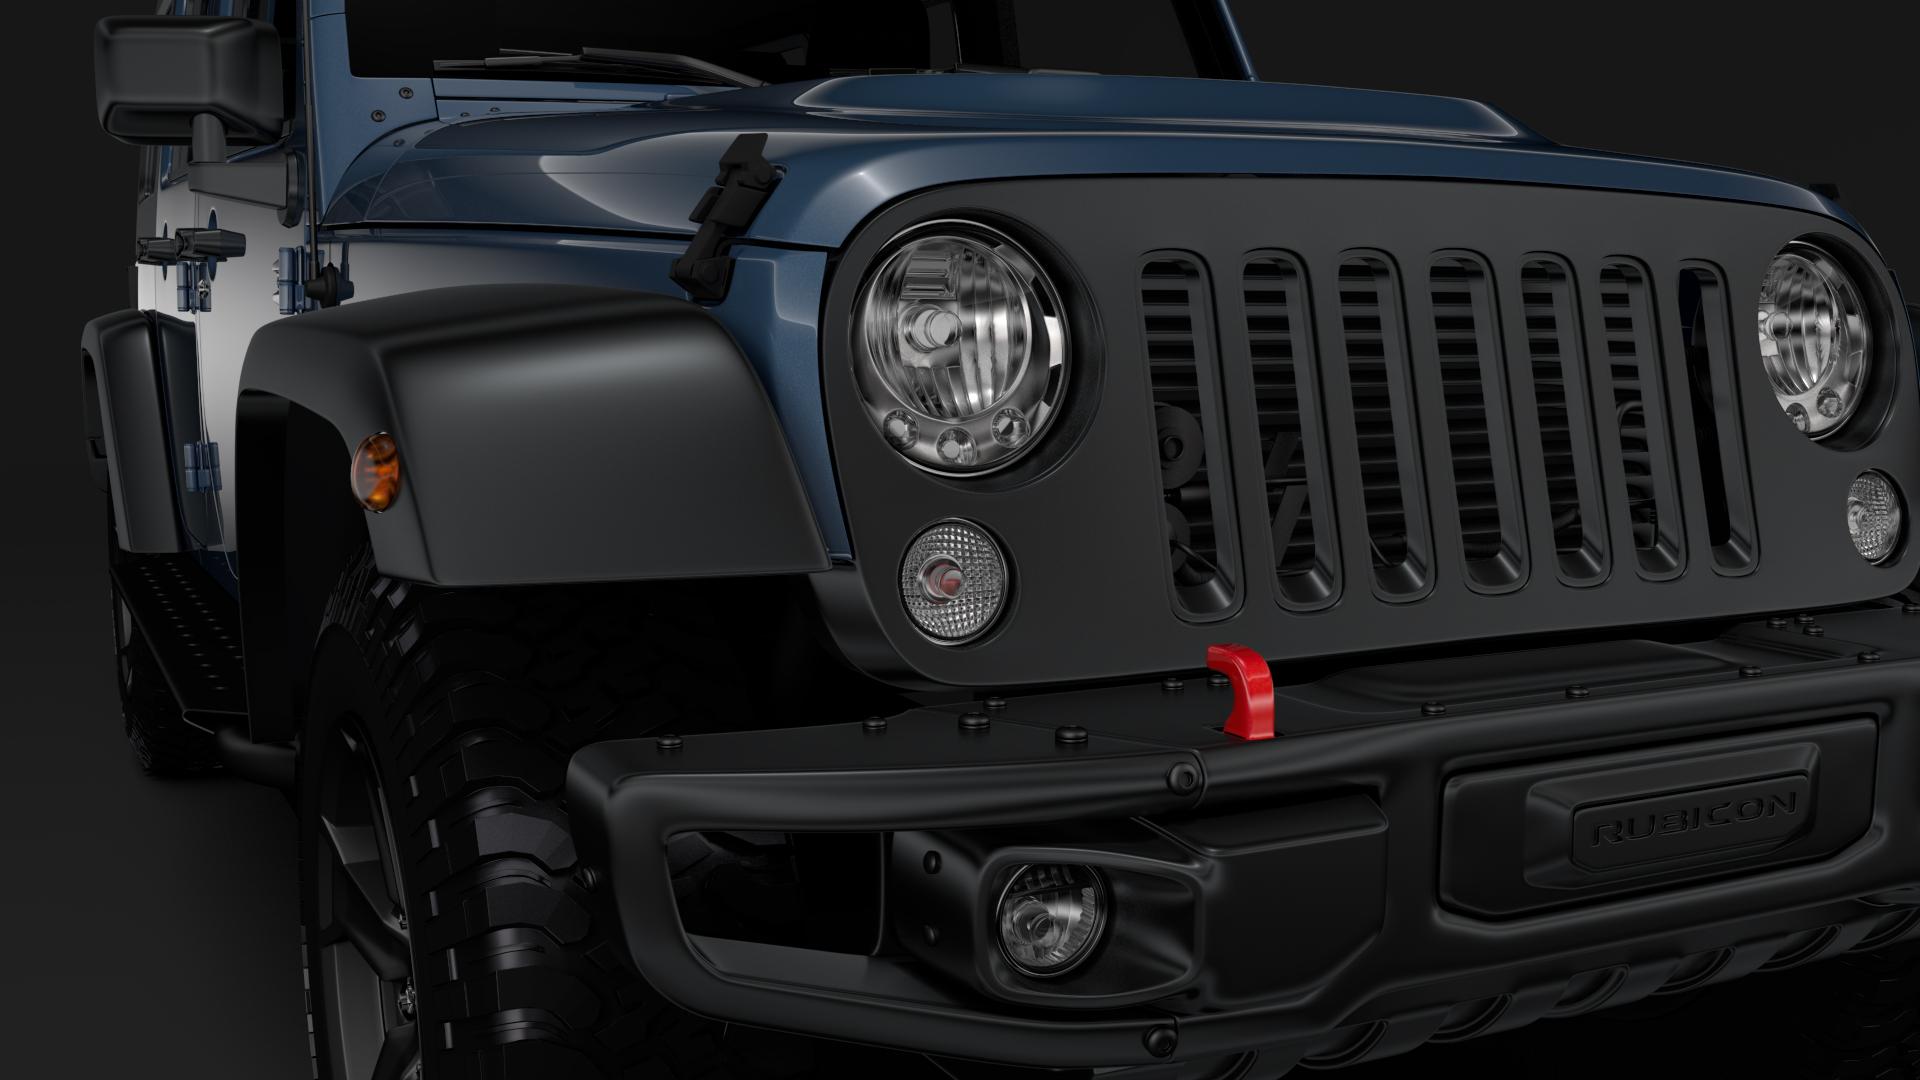 jeep wrangler unlimited rubicon recon jk 2017 3d model max fbx c4d lwo ma mb hrc xsi obj 277005